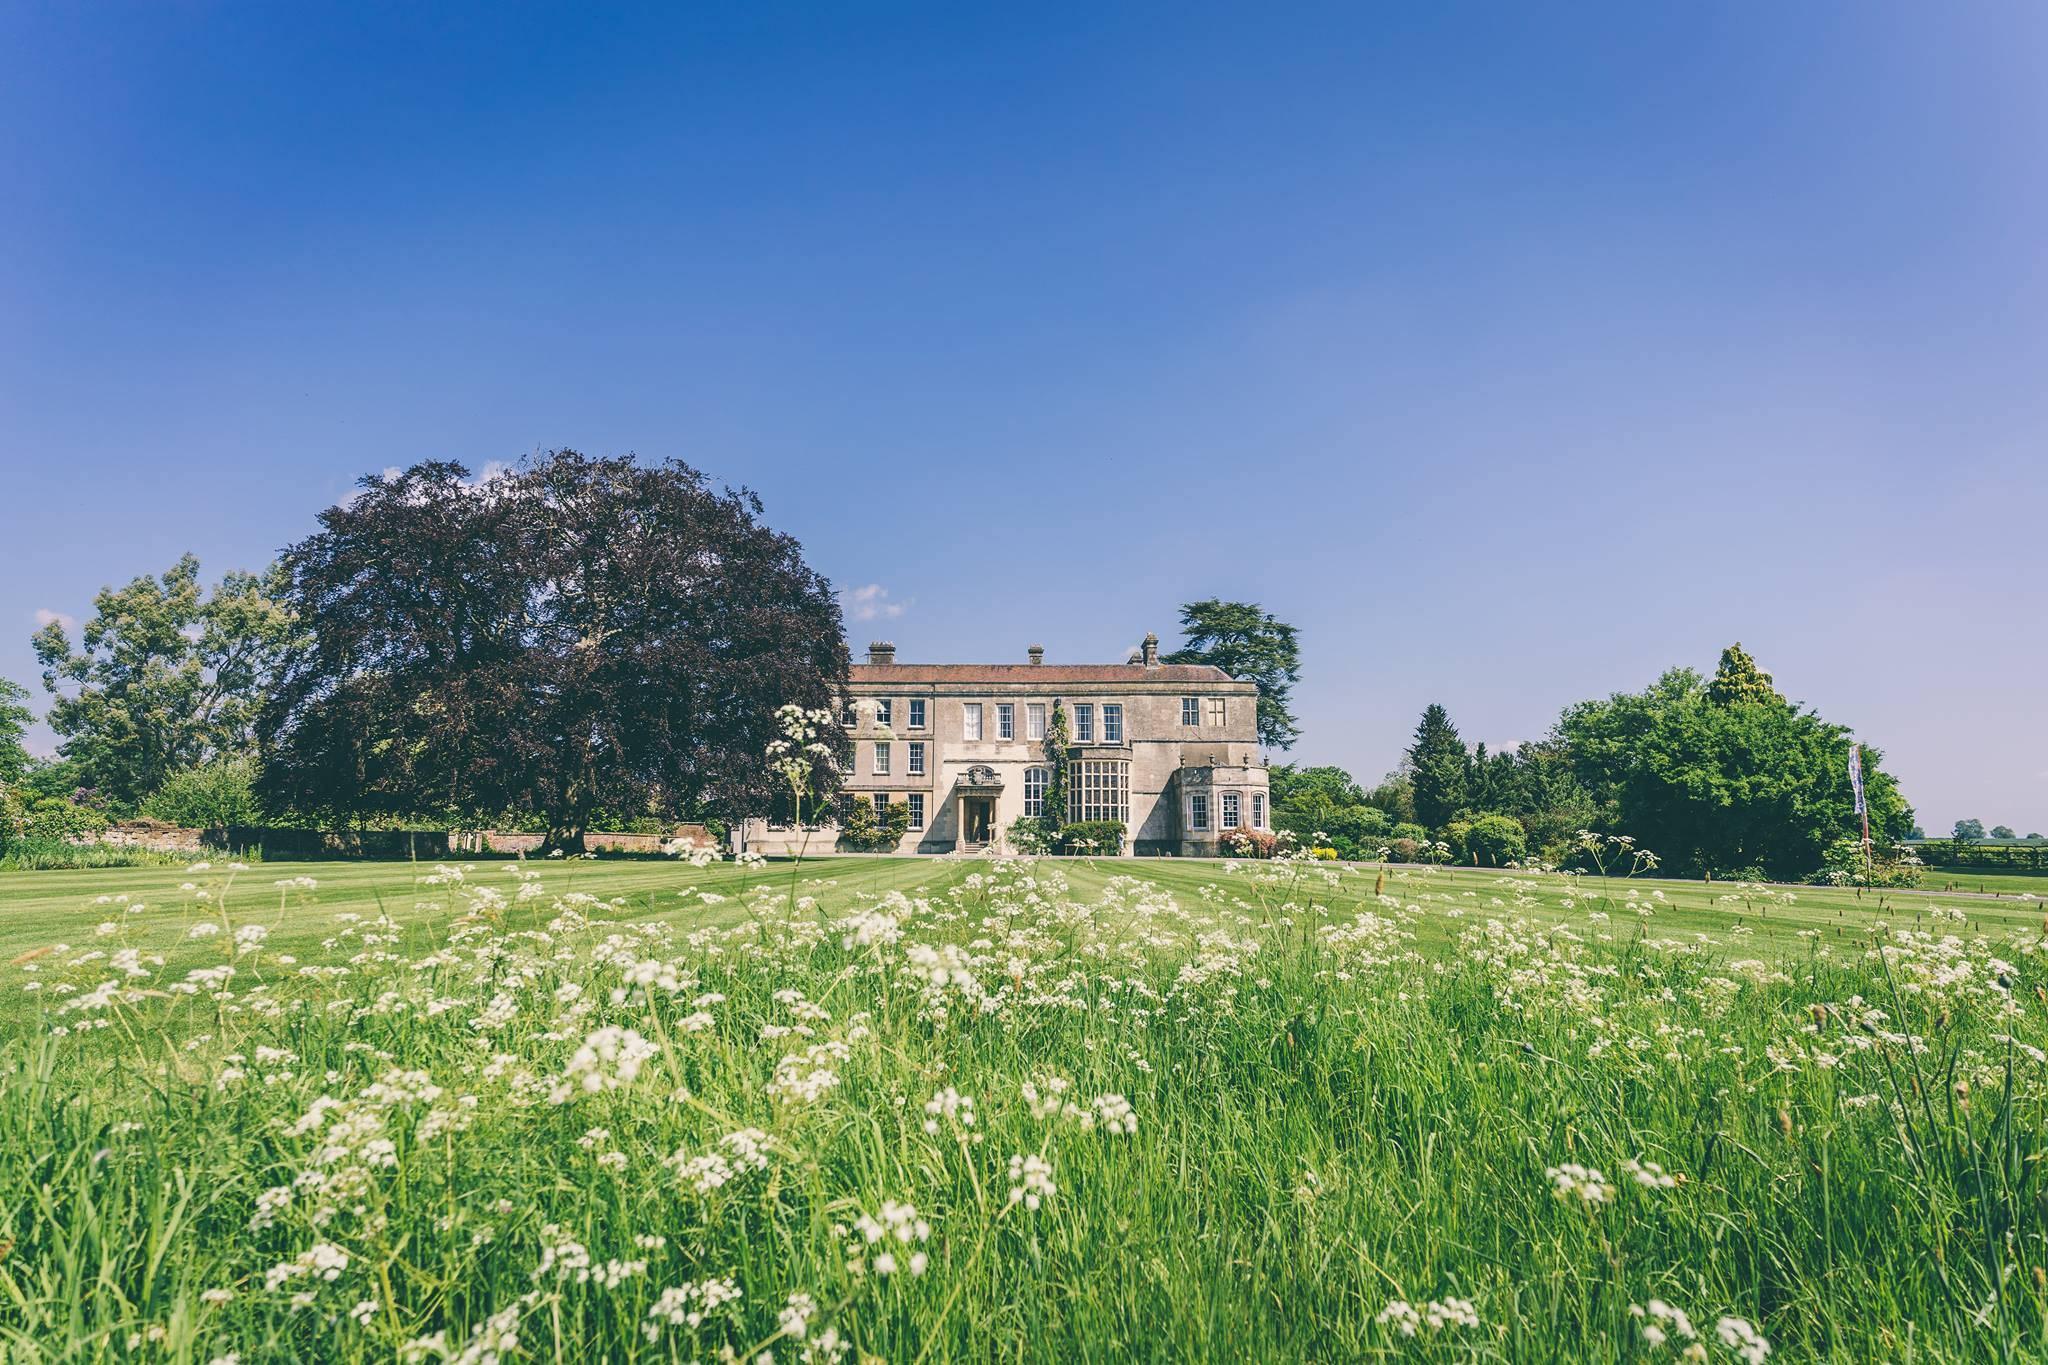 Elmore court weddings wedding venues in gloucester